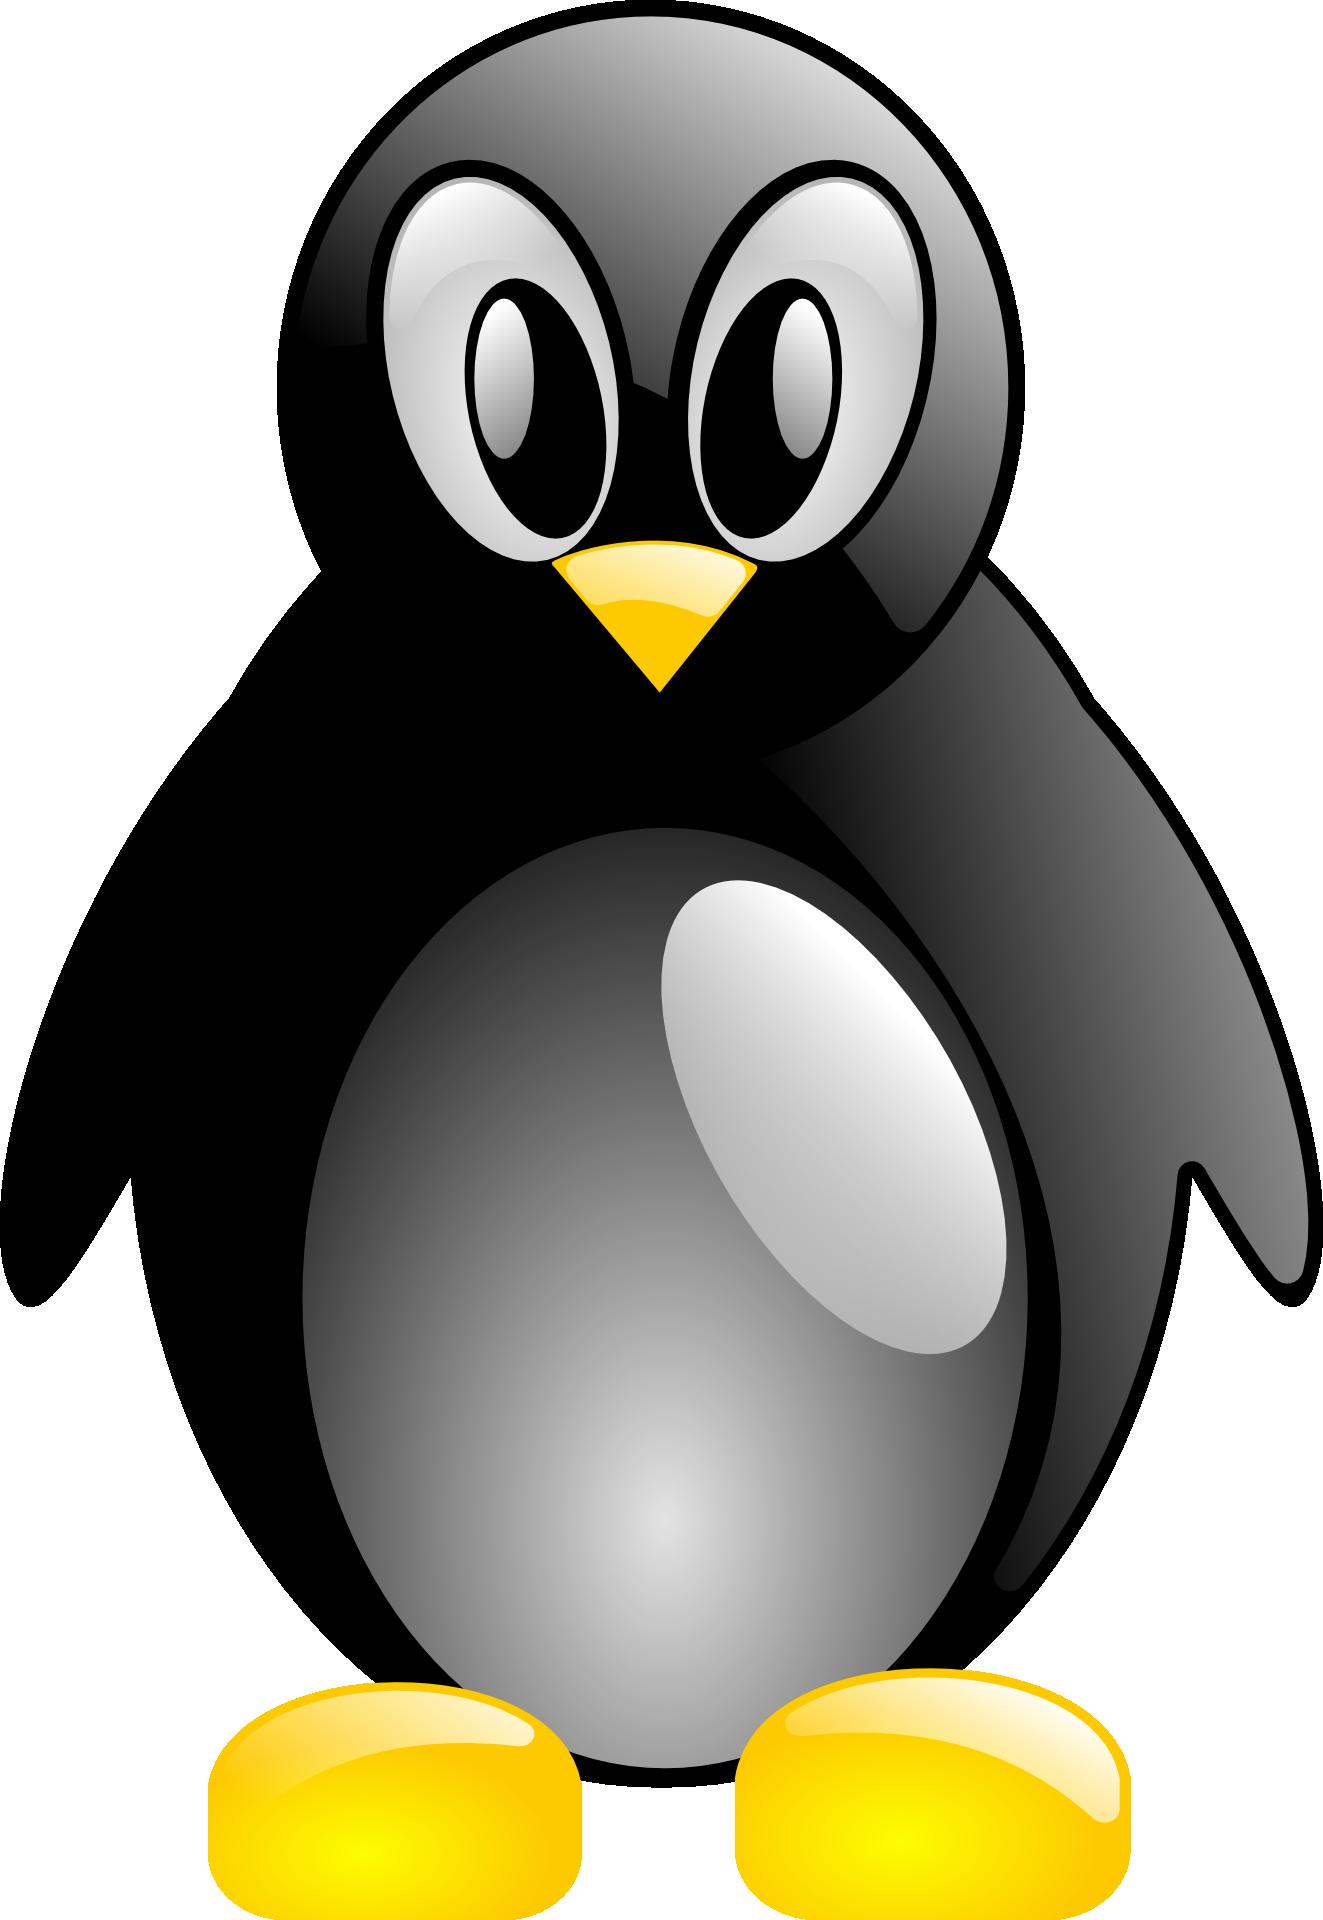 Penguin Linux Tux Animal Bird free image